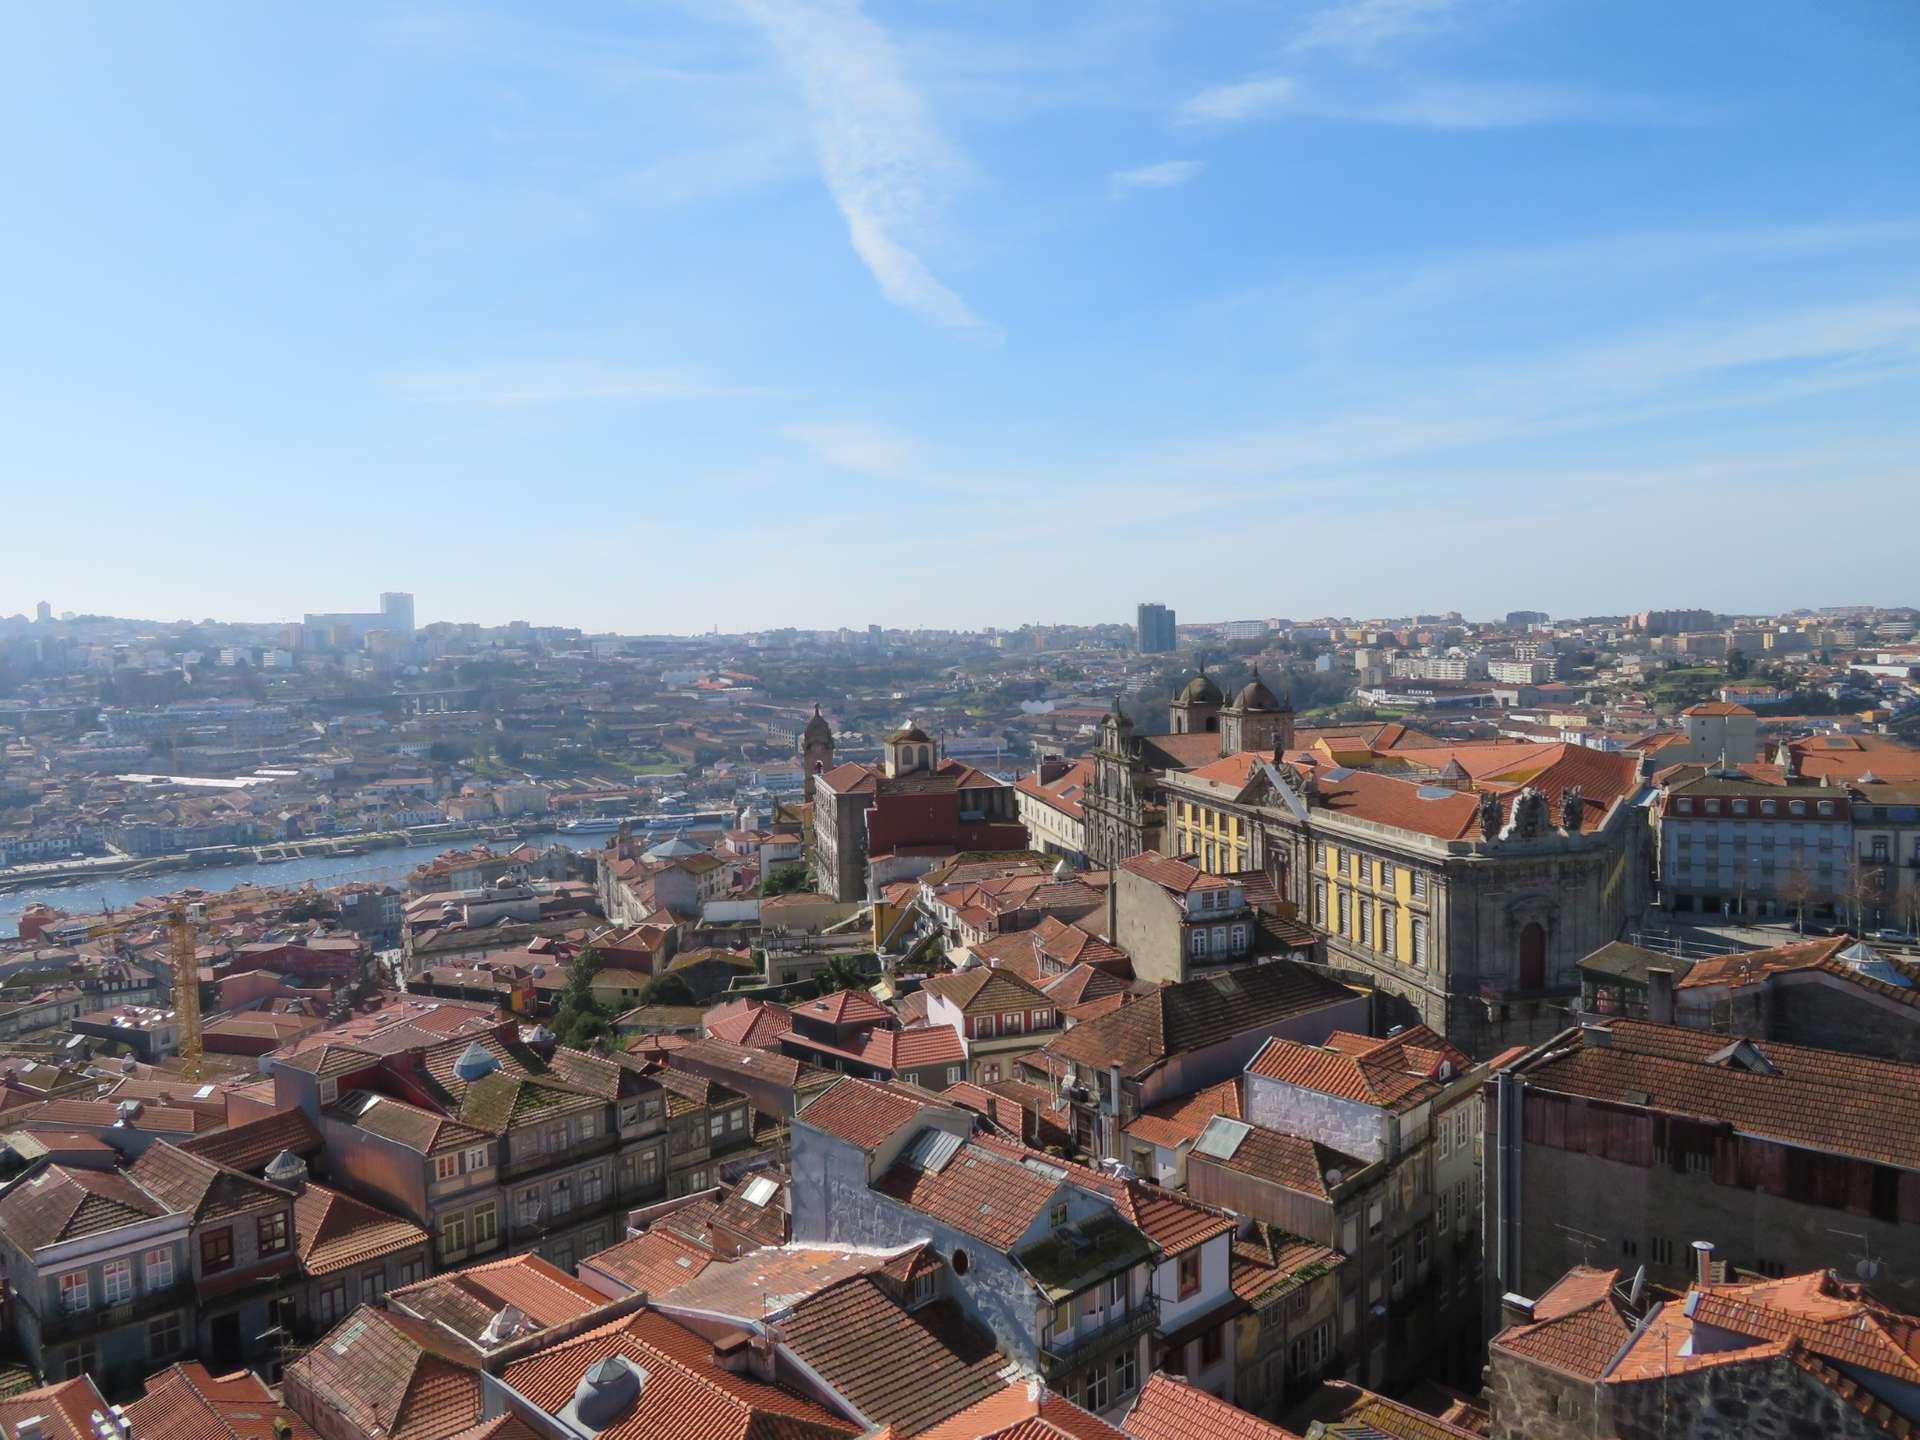 Uitzicht over Porto, Portugal